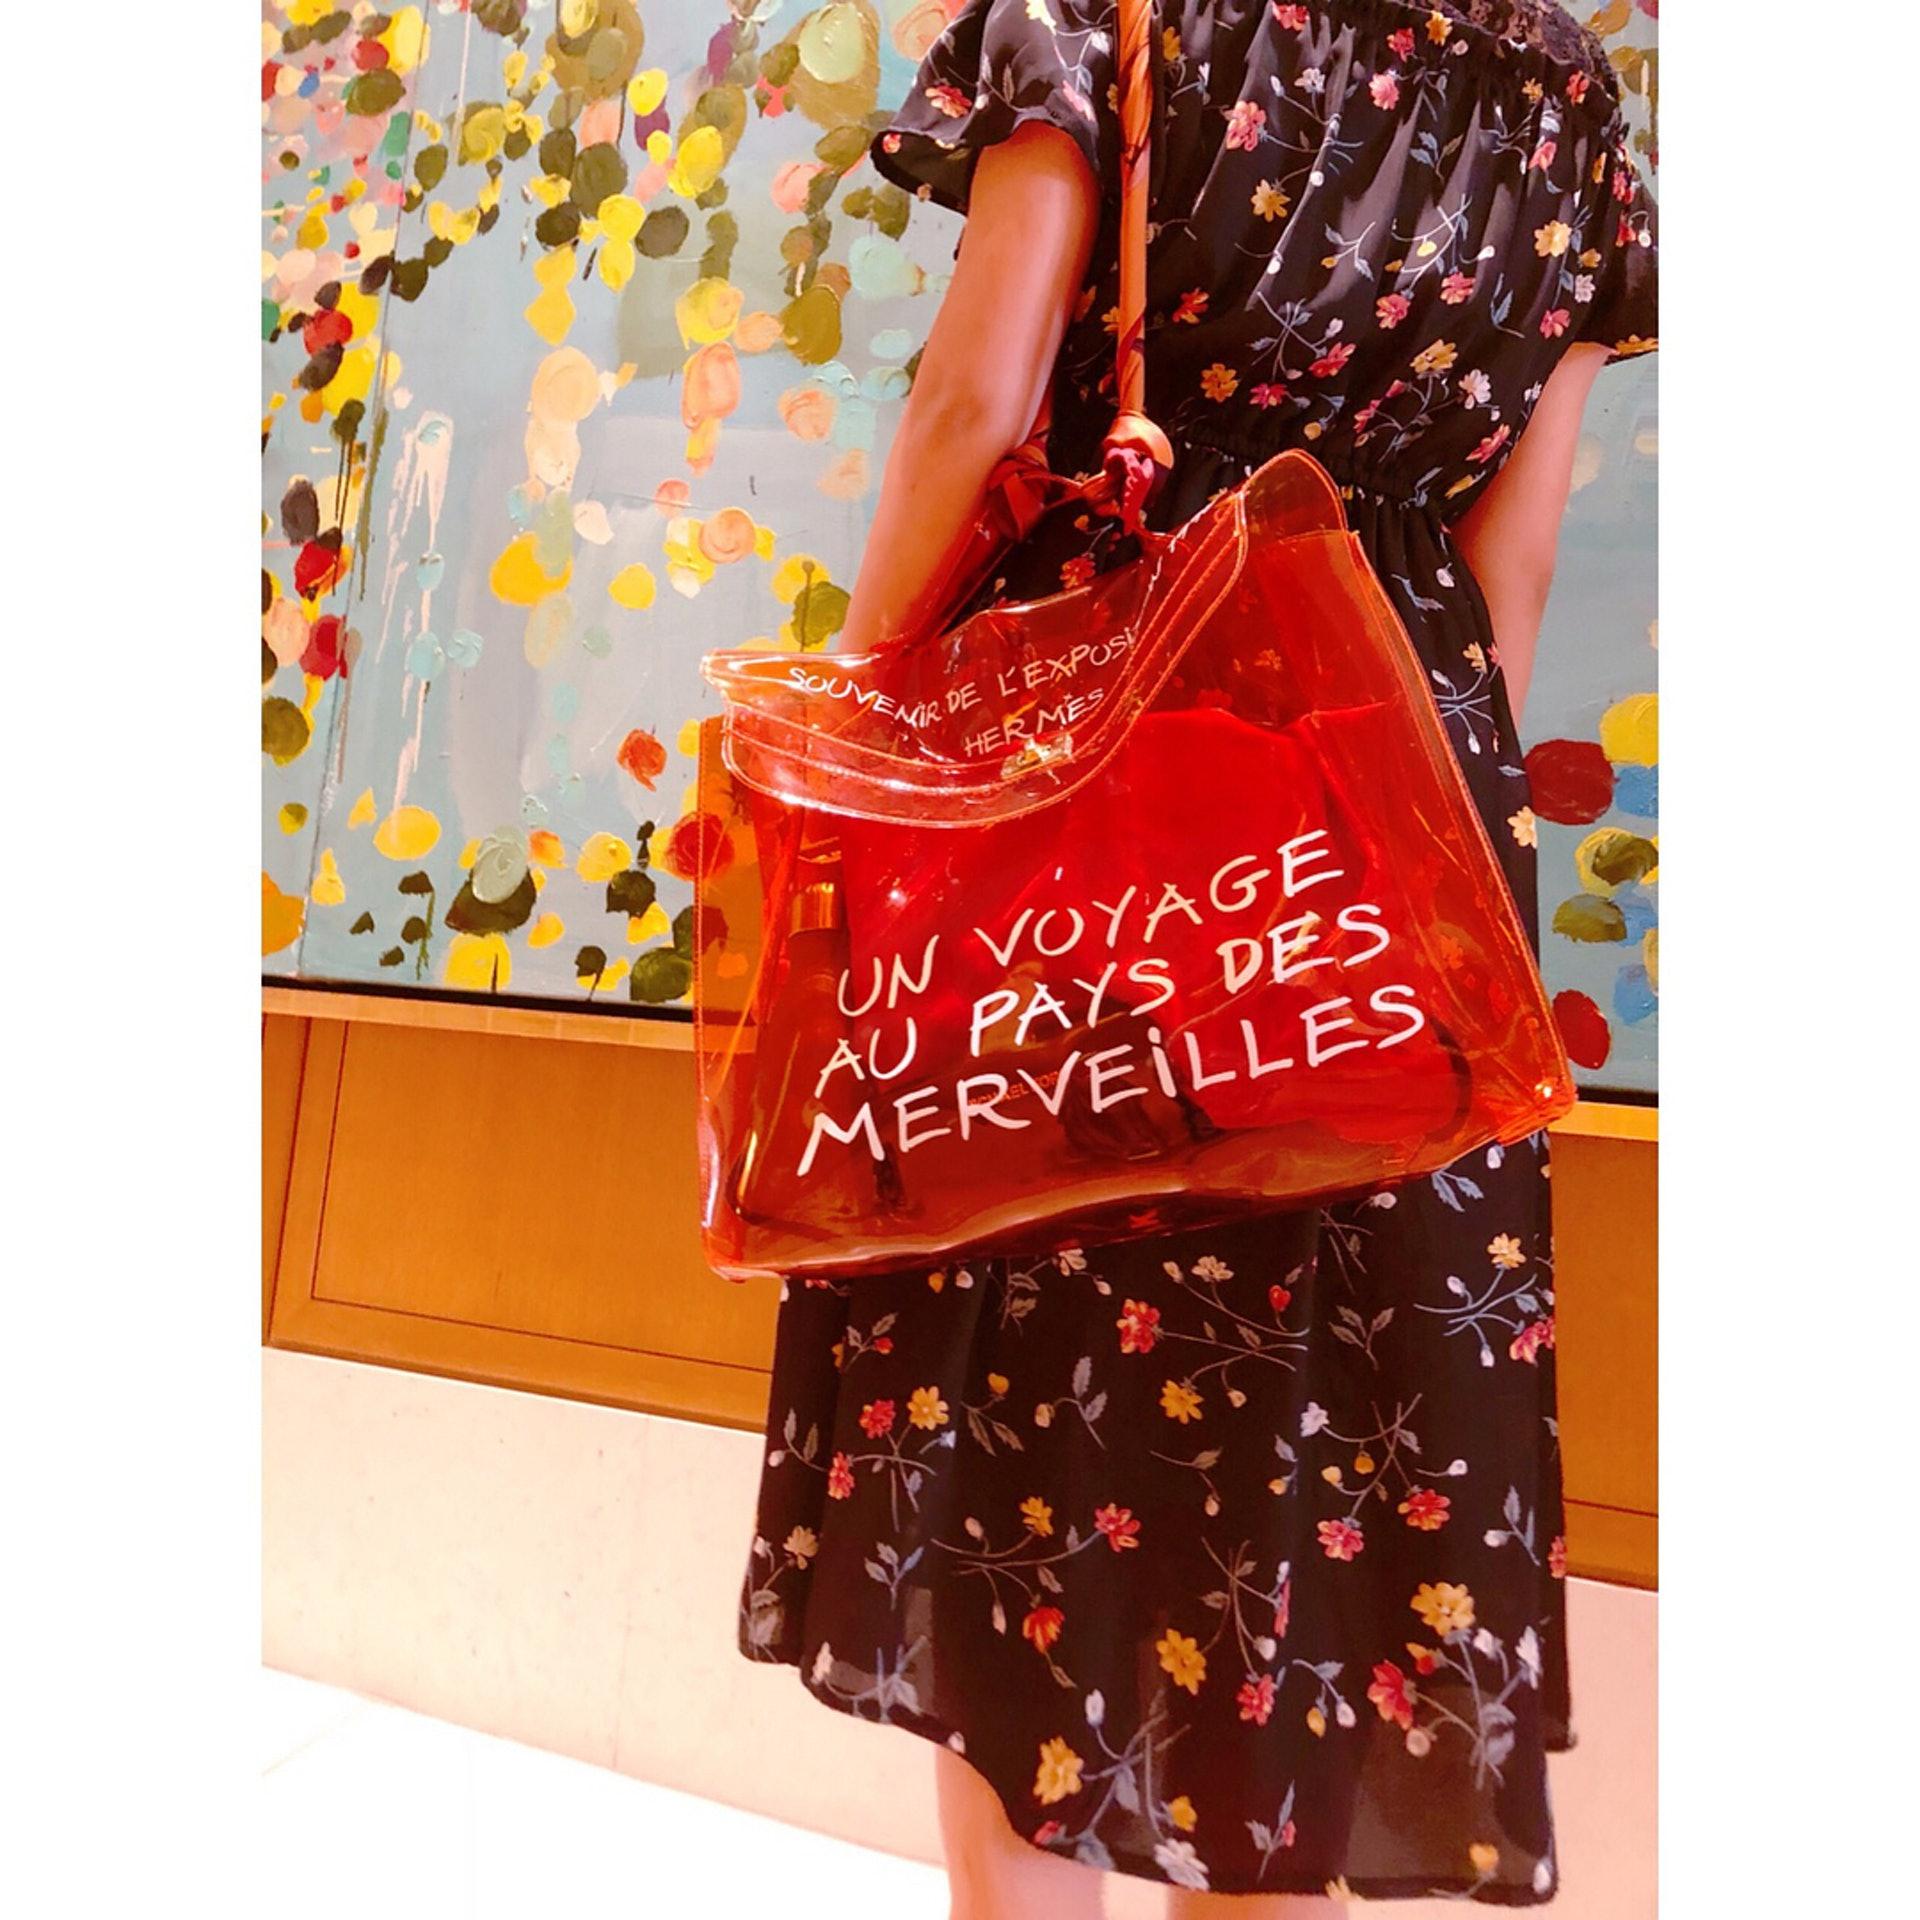 b73a4a5e7fc4 Hermès 透明袋Vinyl Kelly Bag,IG熱捧網紅袋平民負擔得起?|香港01 ...